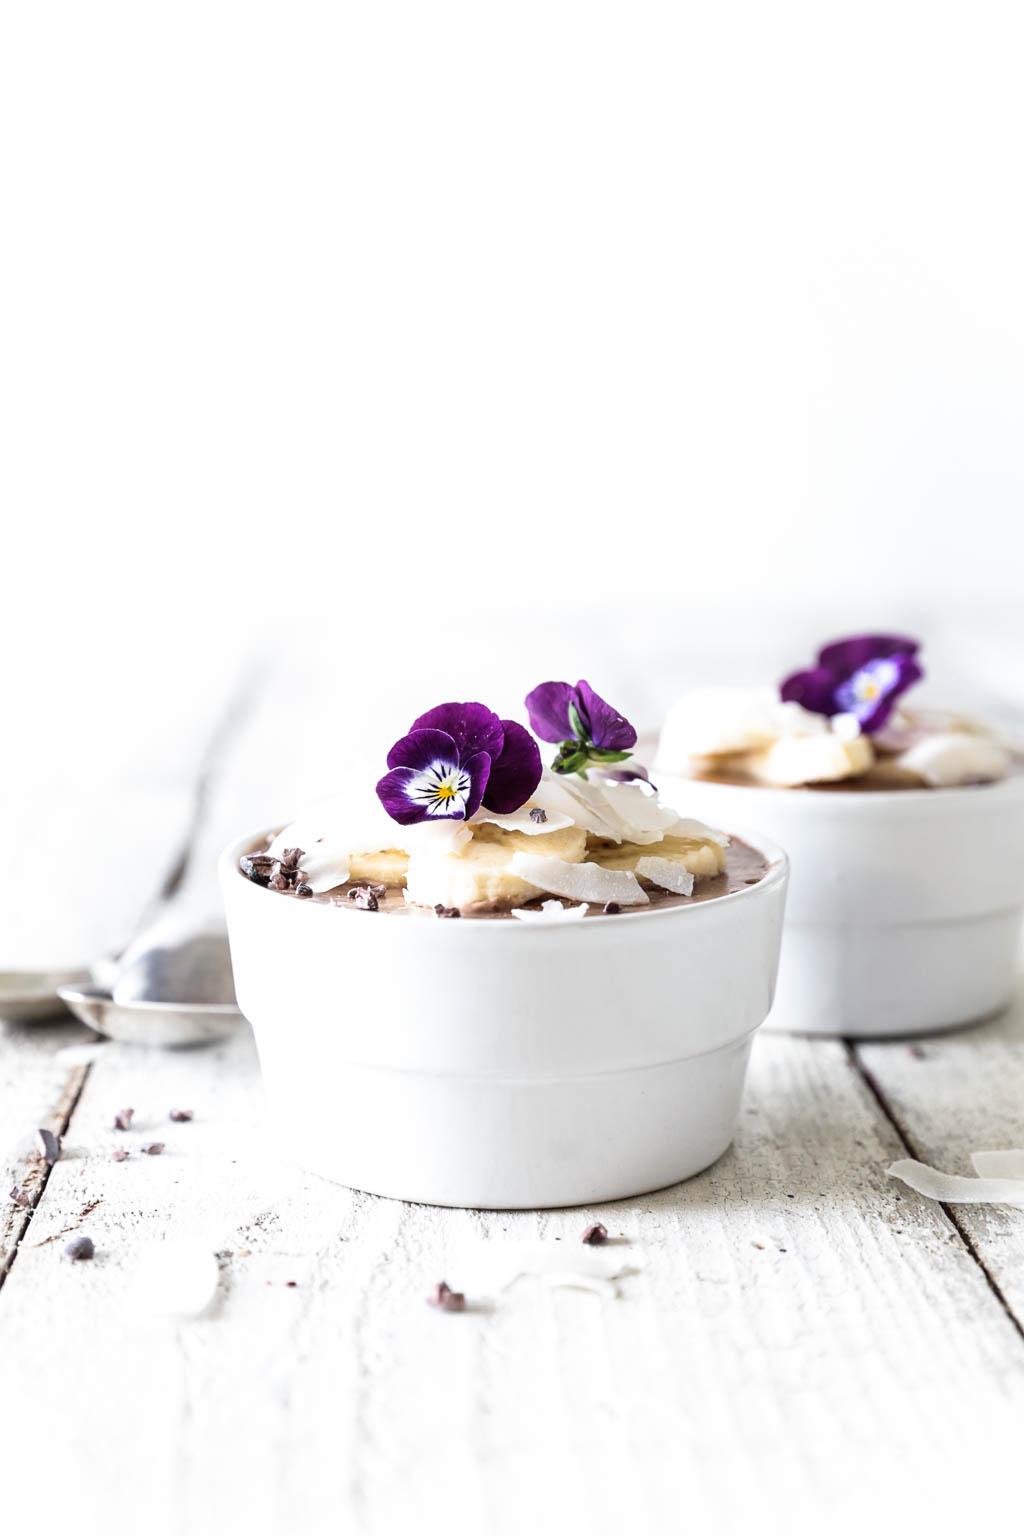 Coconut & Banana Chocolate Mousse